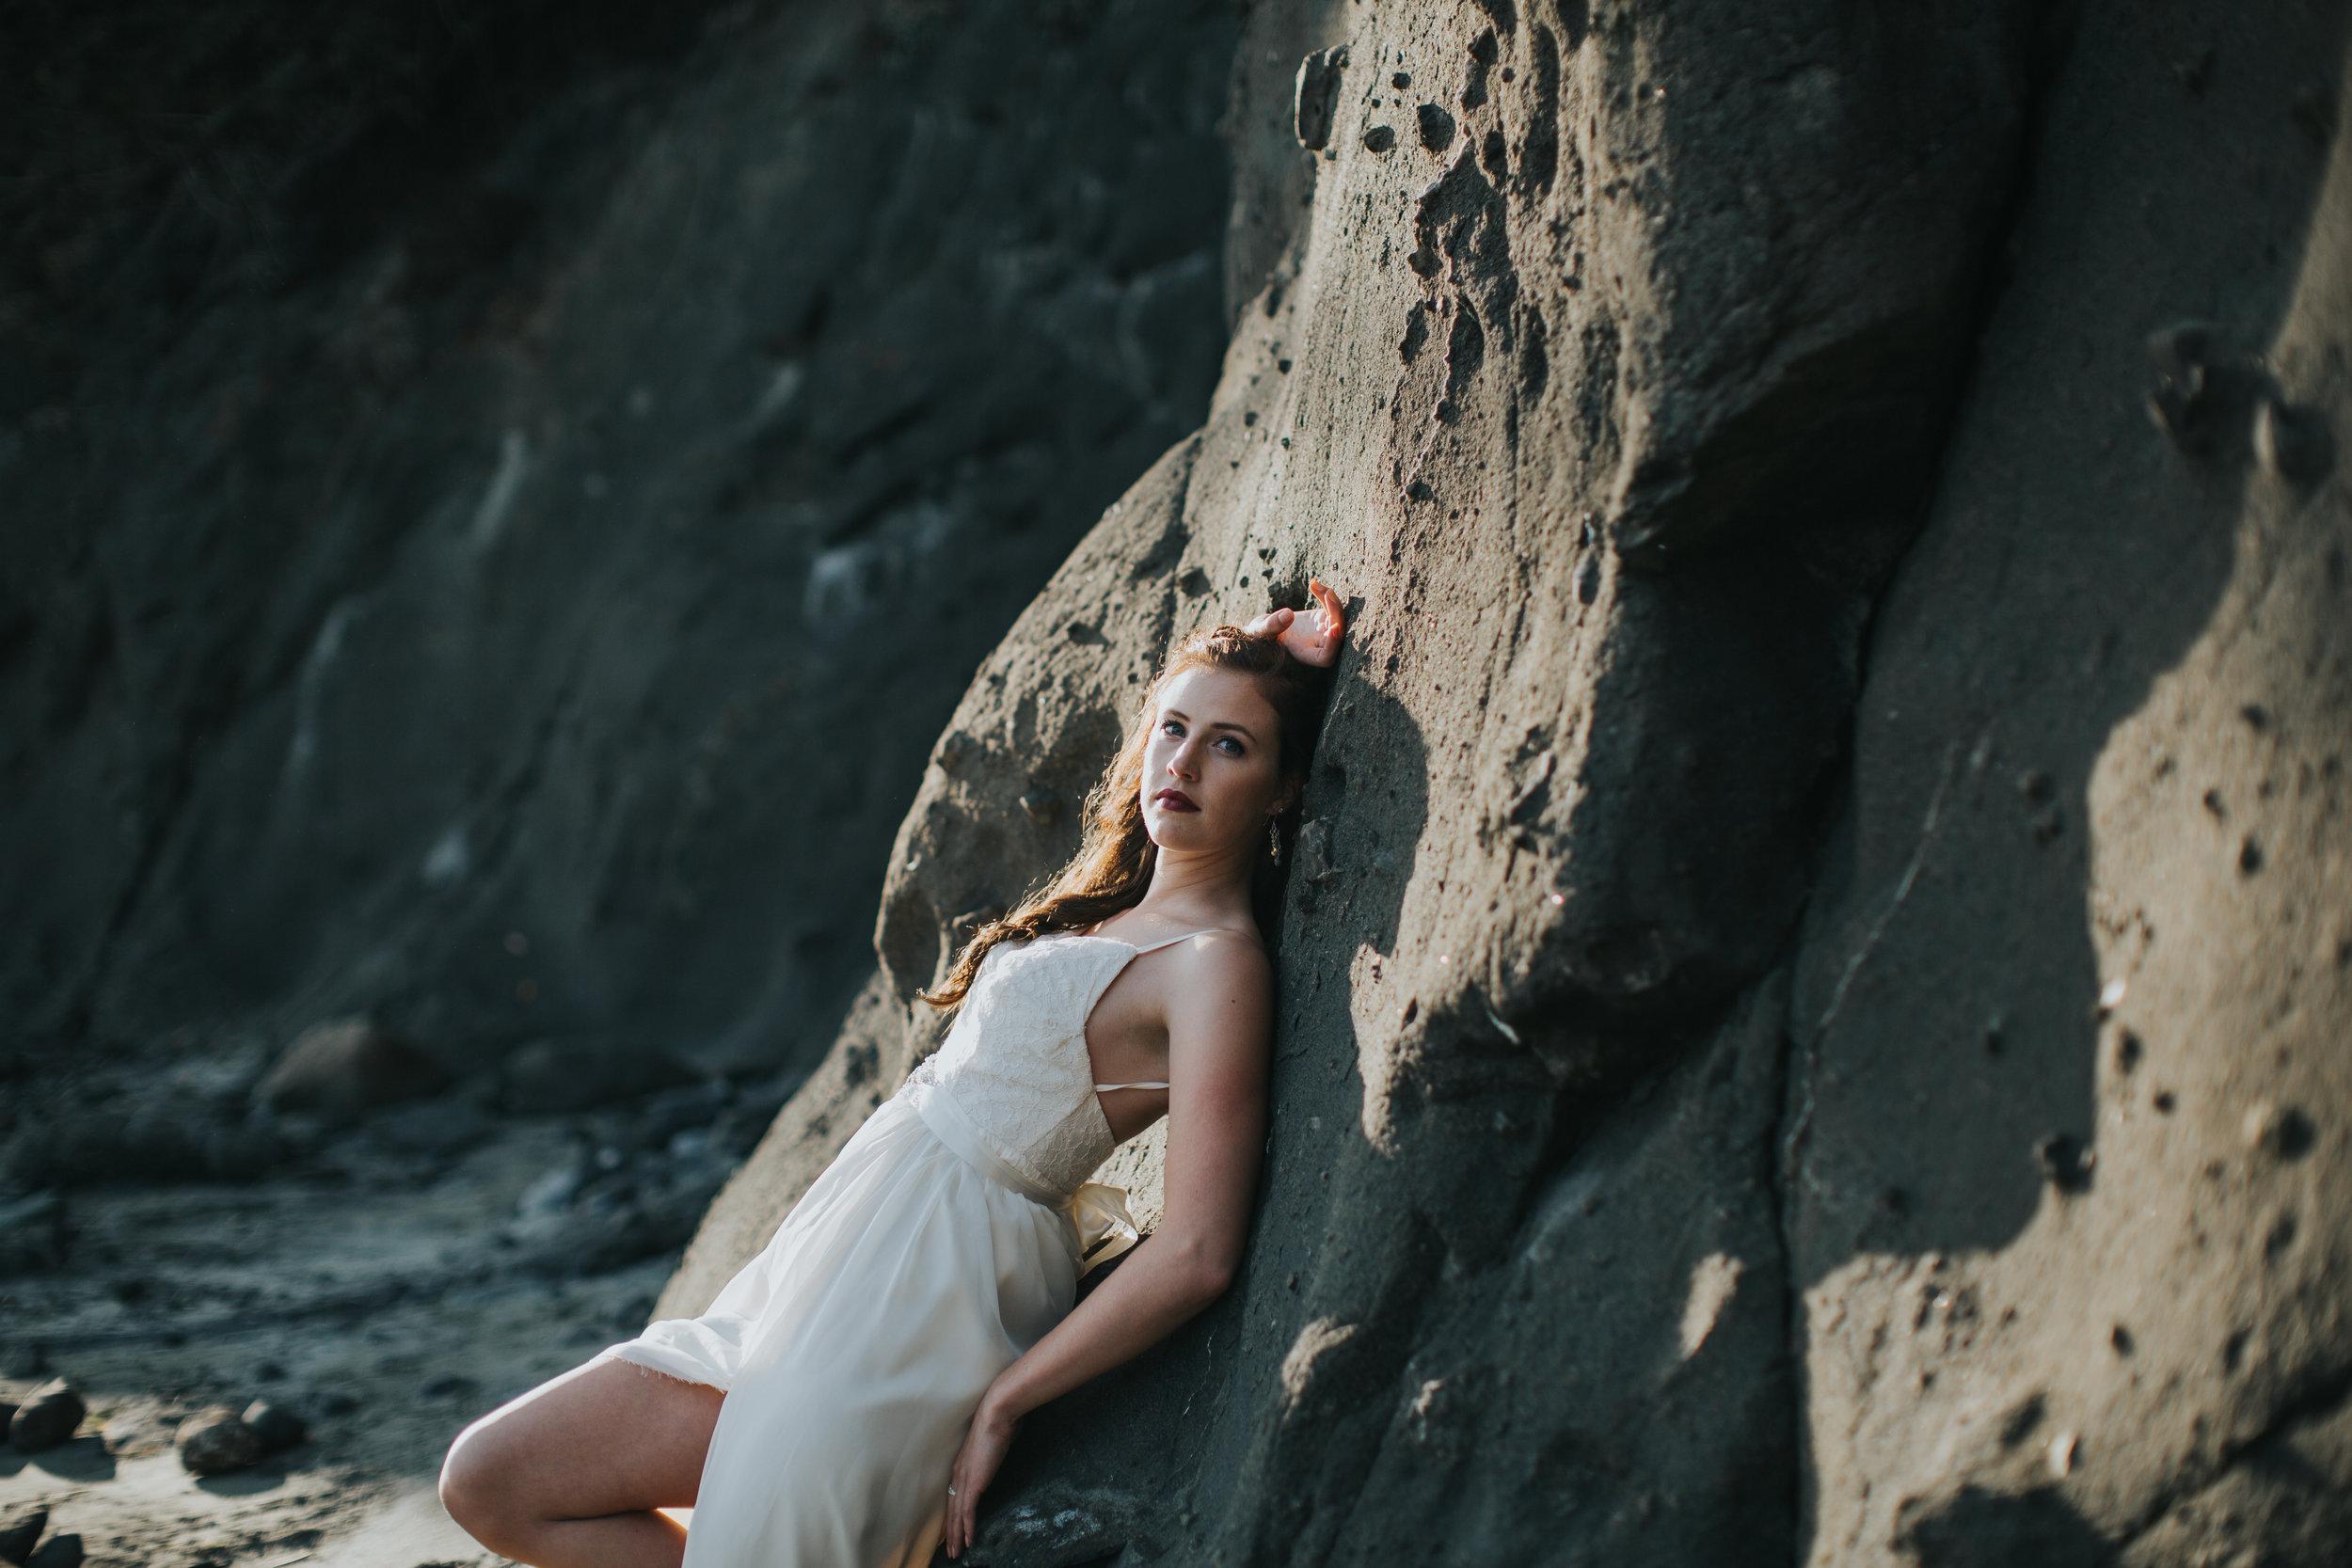 Port-Angeles-Salt-Creek-beach-wedding-bride-PNW-olympic-peninsula-photographer-Kayla-Dawn-Photography-outdoors-golden-hour-dancer-dress (10).jpg